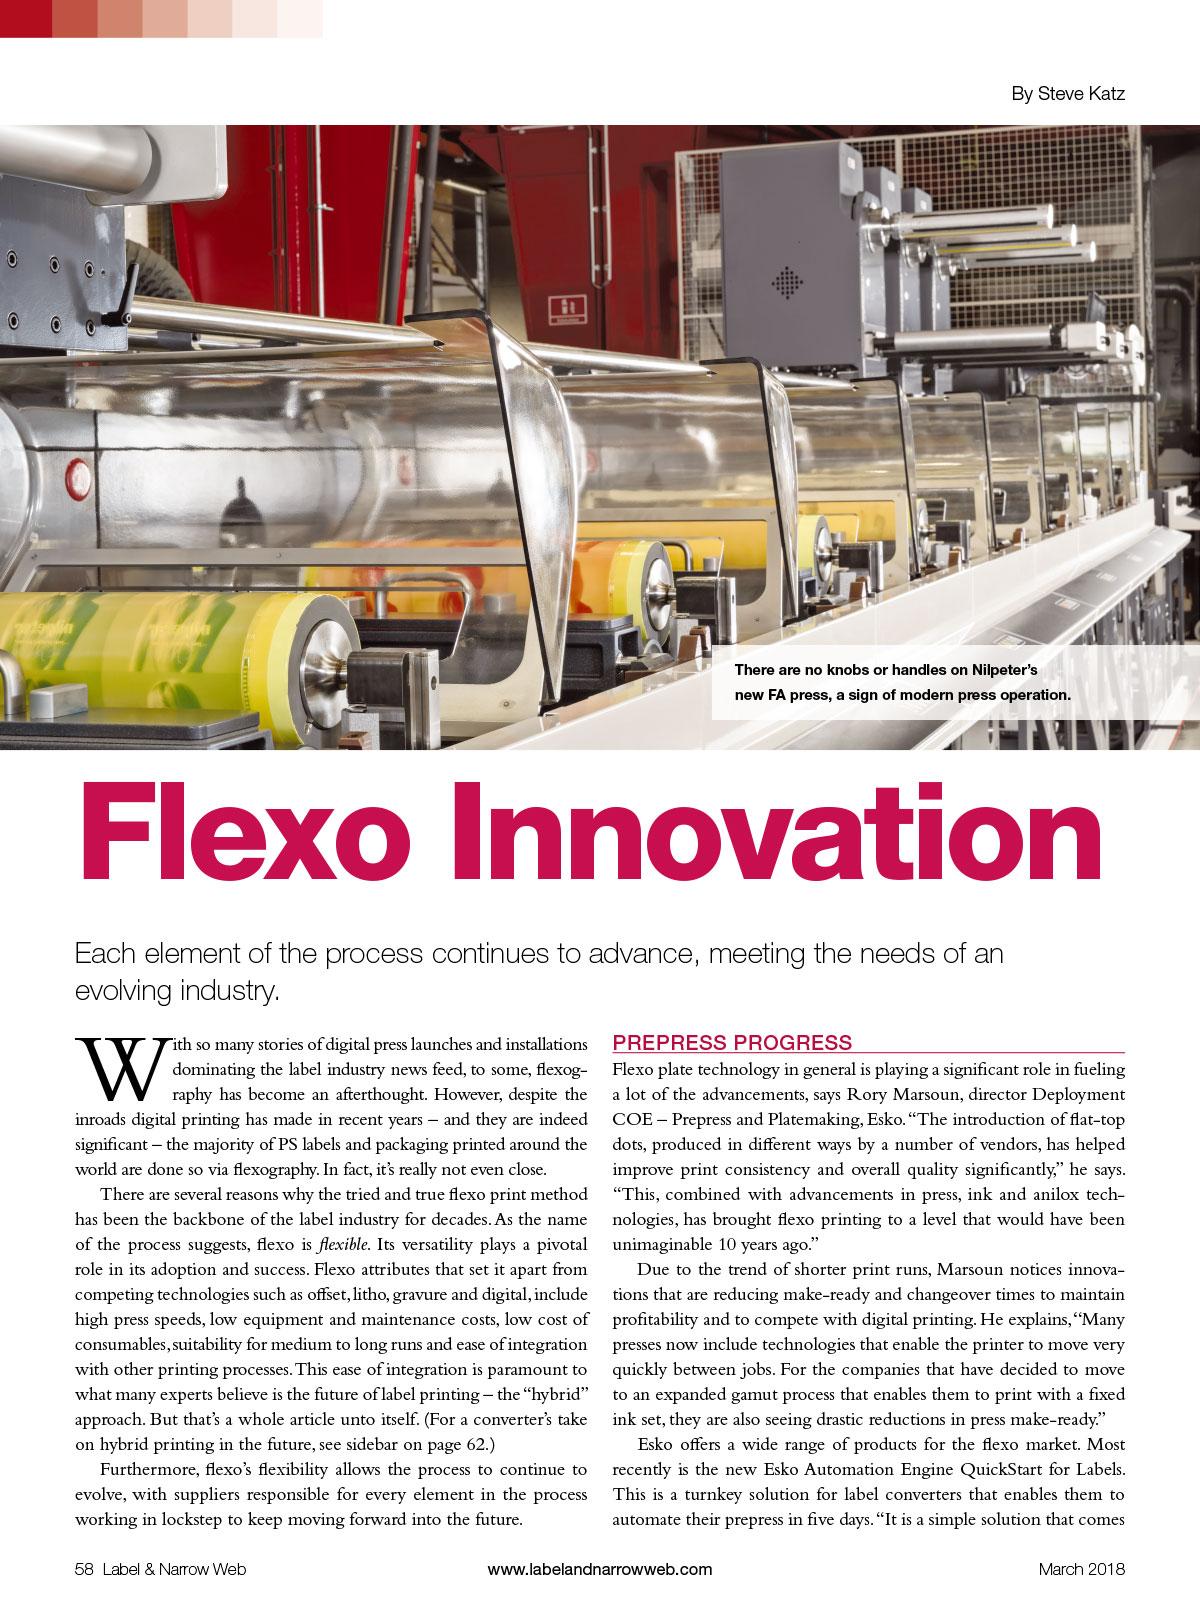 Flexo Innovation - Label Narrow Web - Best Full Ultra HD Flexographic Screening